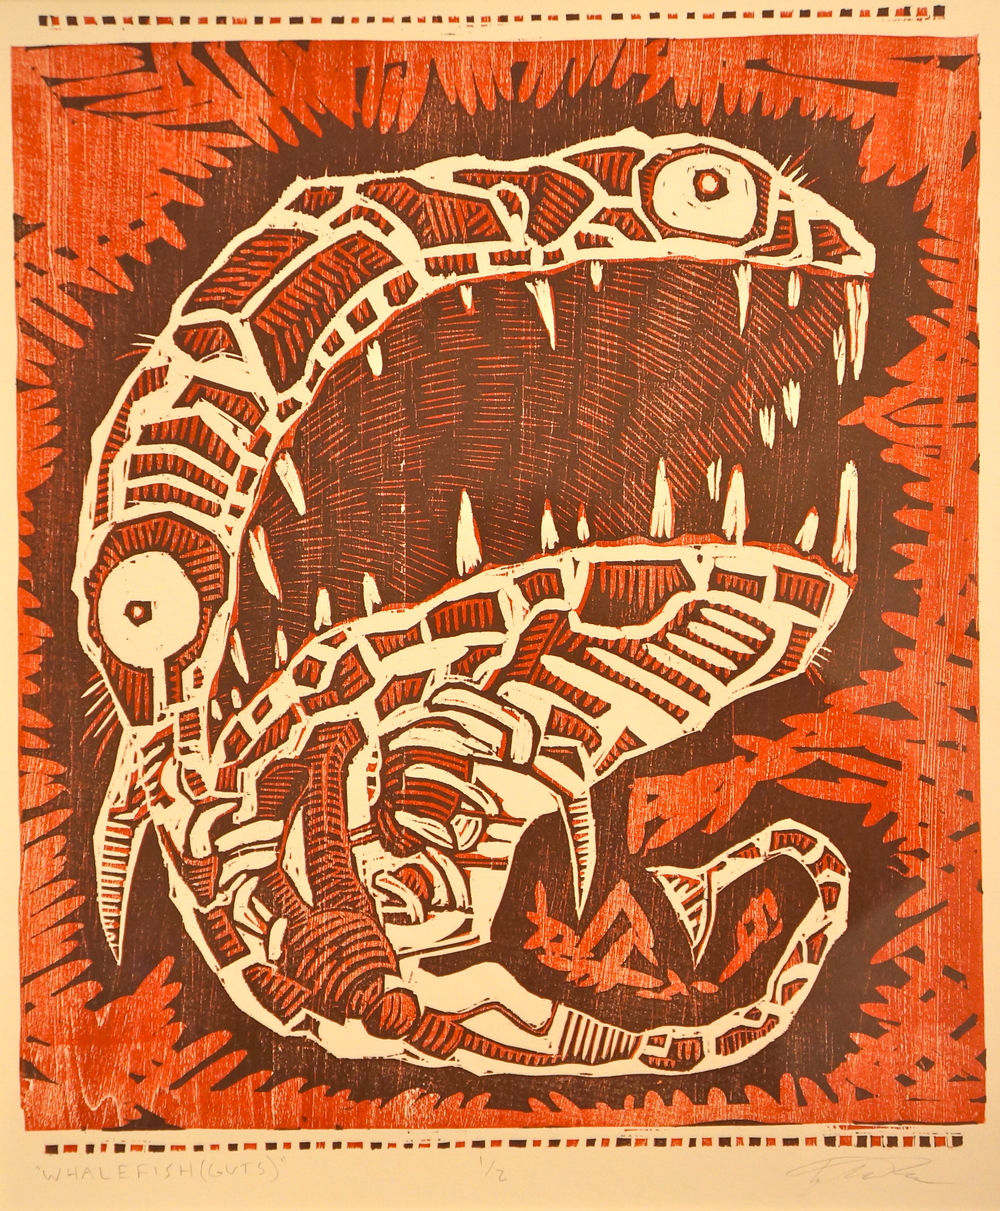 Tyler Green, Walefish (Guts)